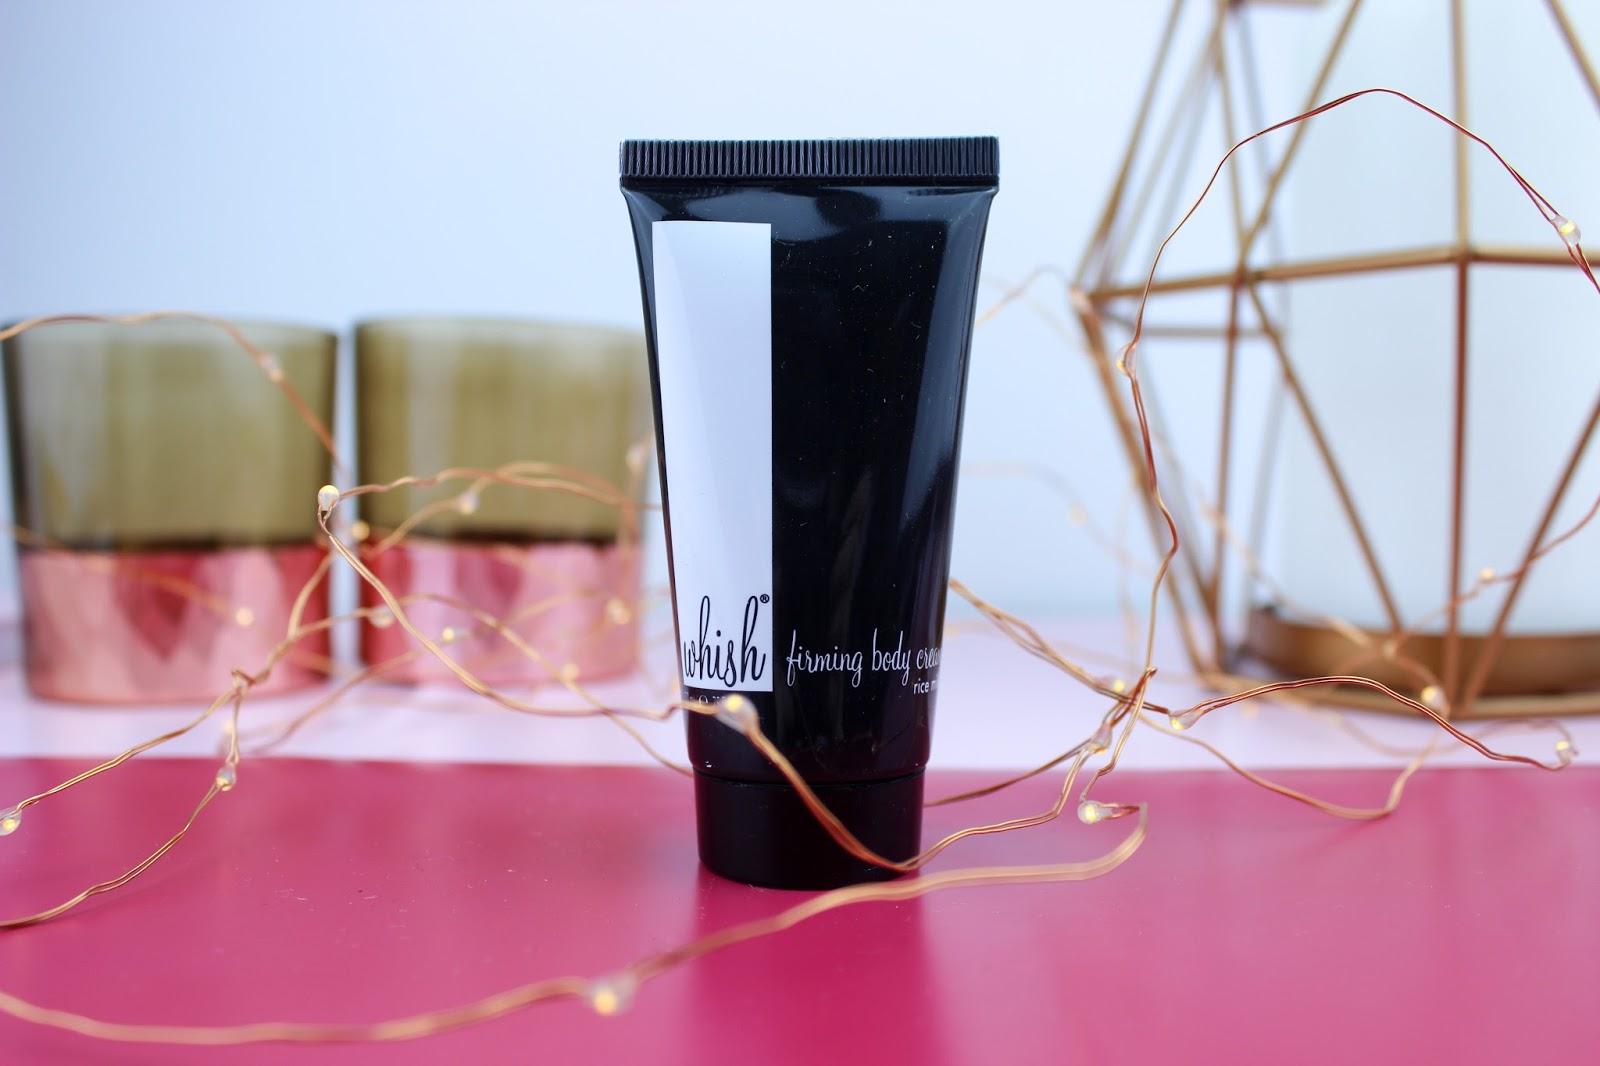 Whish Firming Body Cream